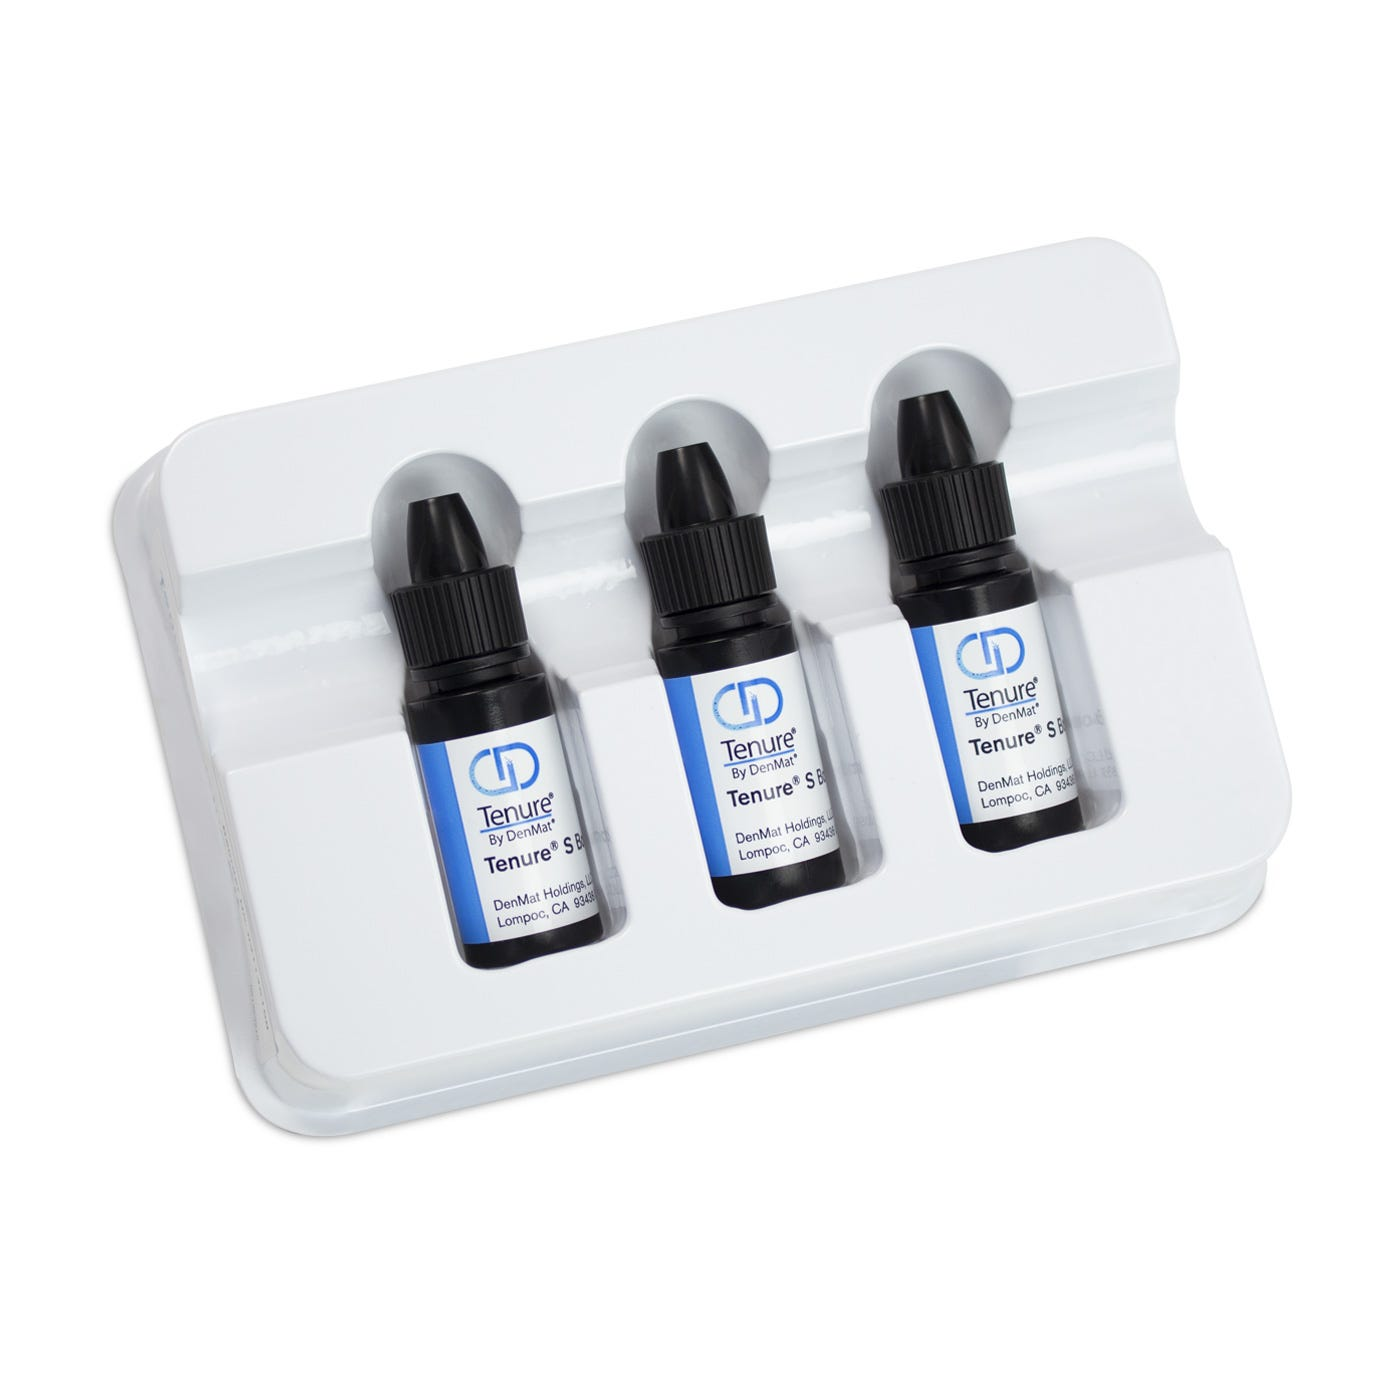 Dental Adhesive - Tenure S Value Kit